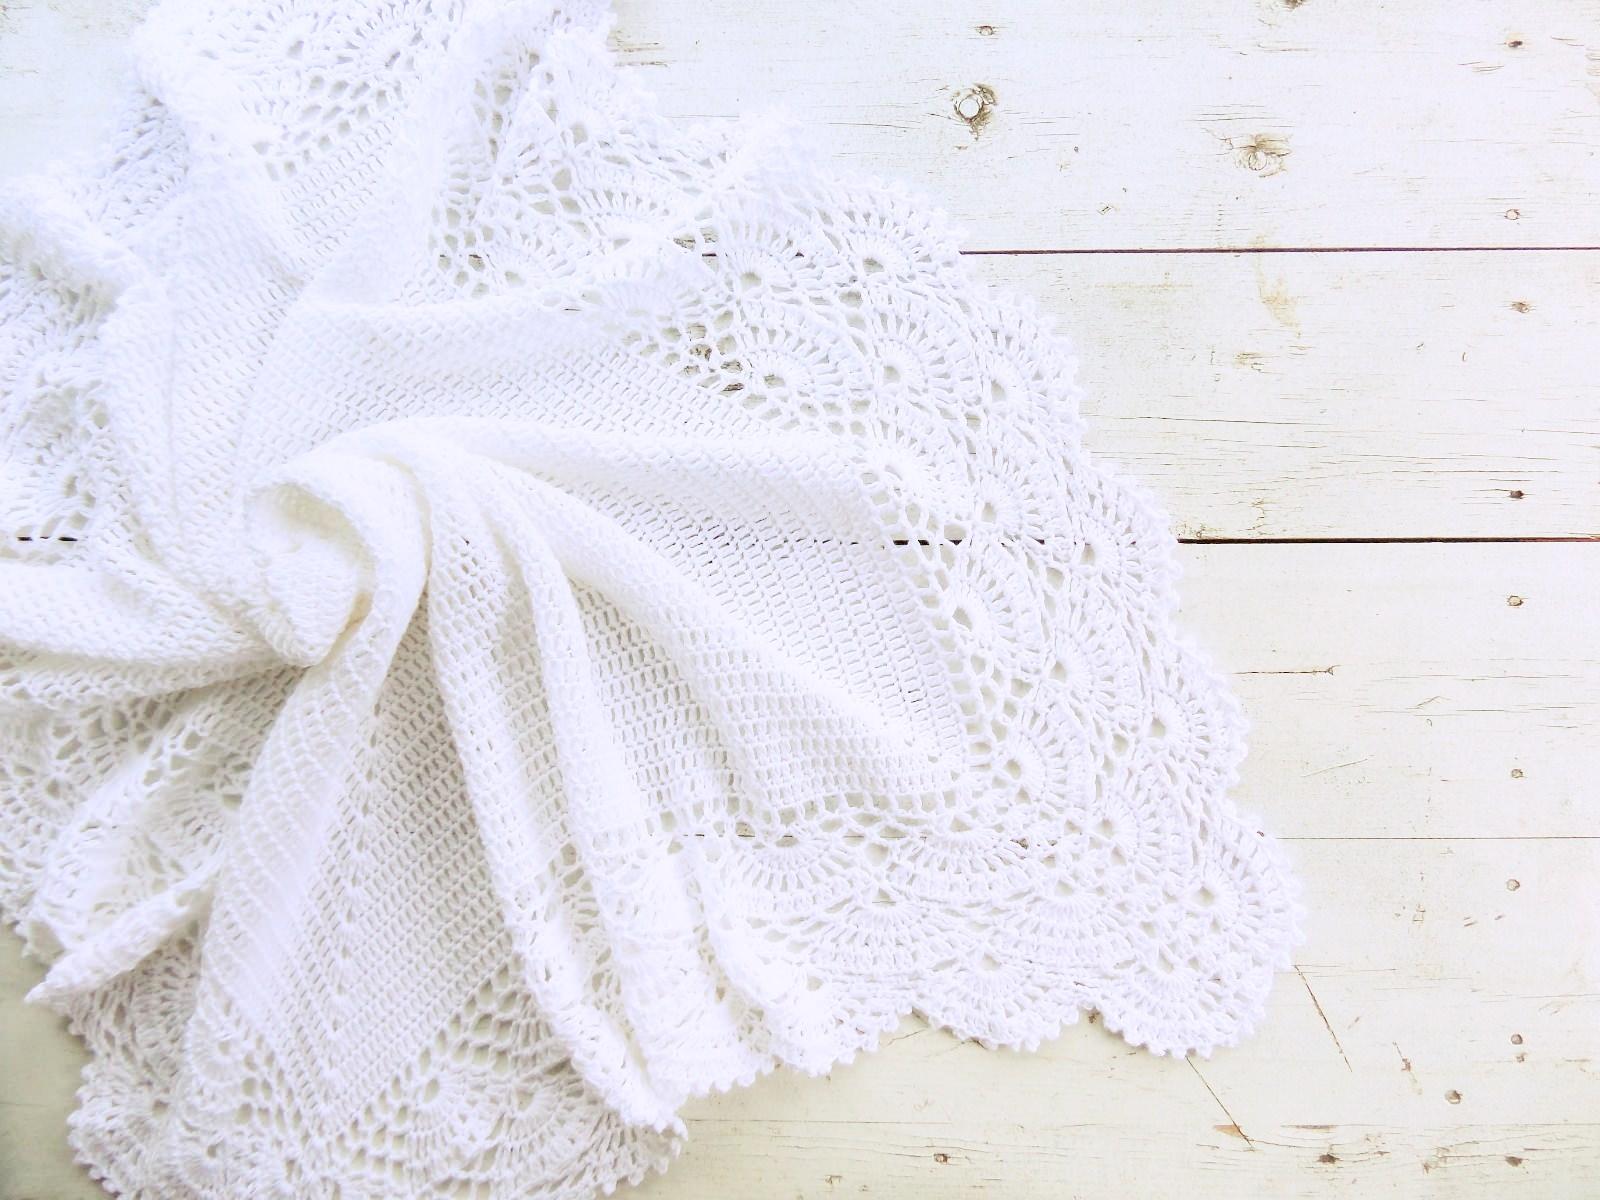 Knitted baby blanket white - PLED 313